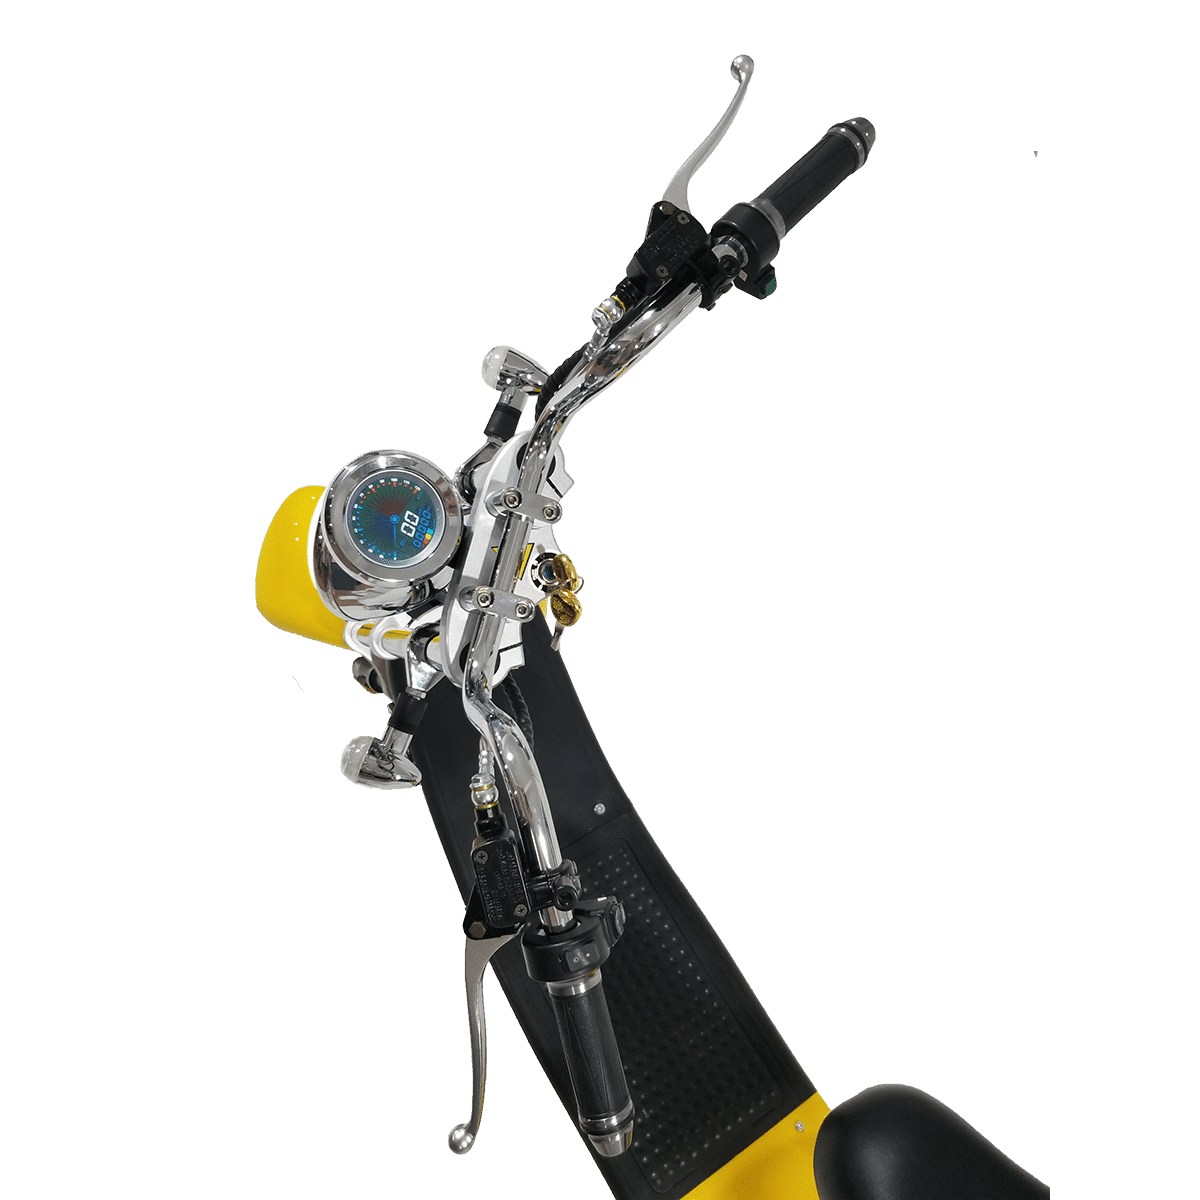 Citycoco Harley Deluxe Jaune avec 1 batterie offerte en plus 5